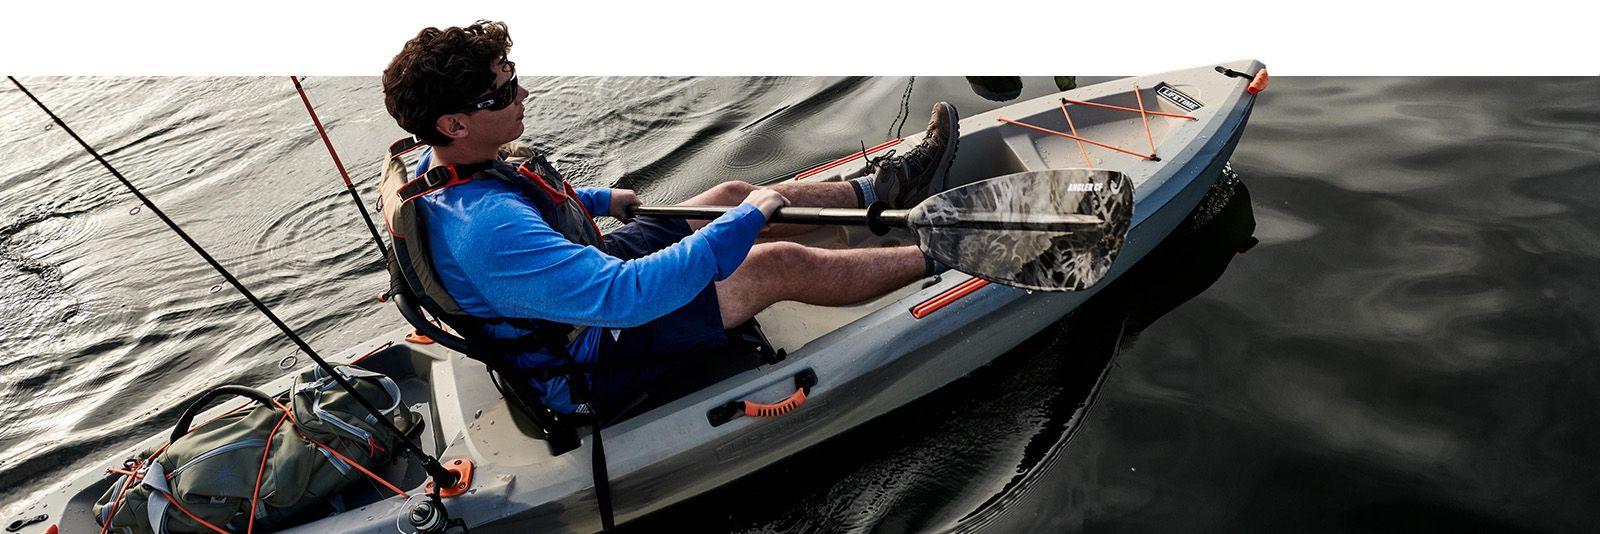 Image of a fisherman propelling along in a Lifetime Teton Pro Angler kayak.